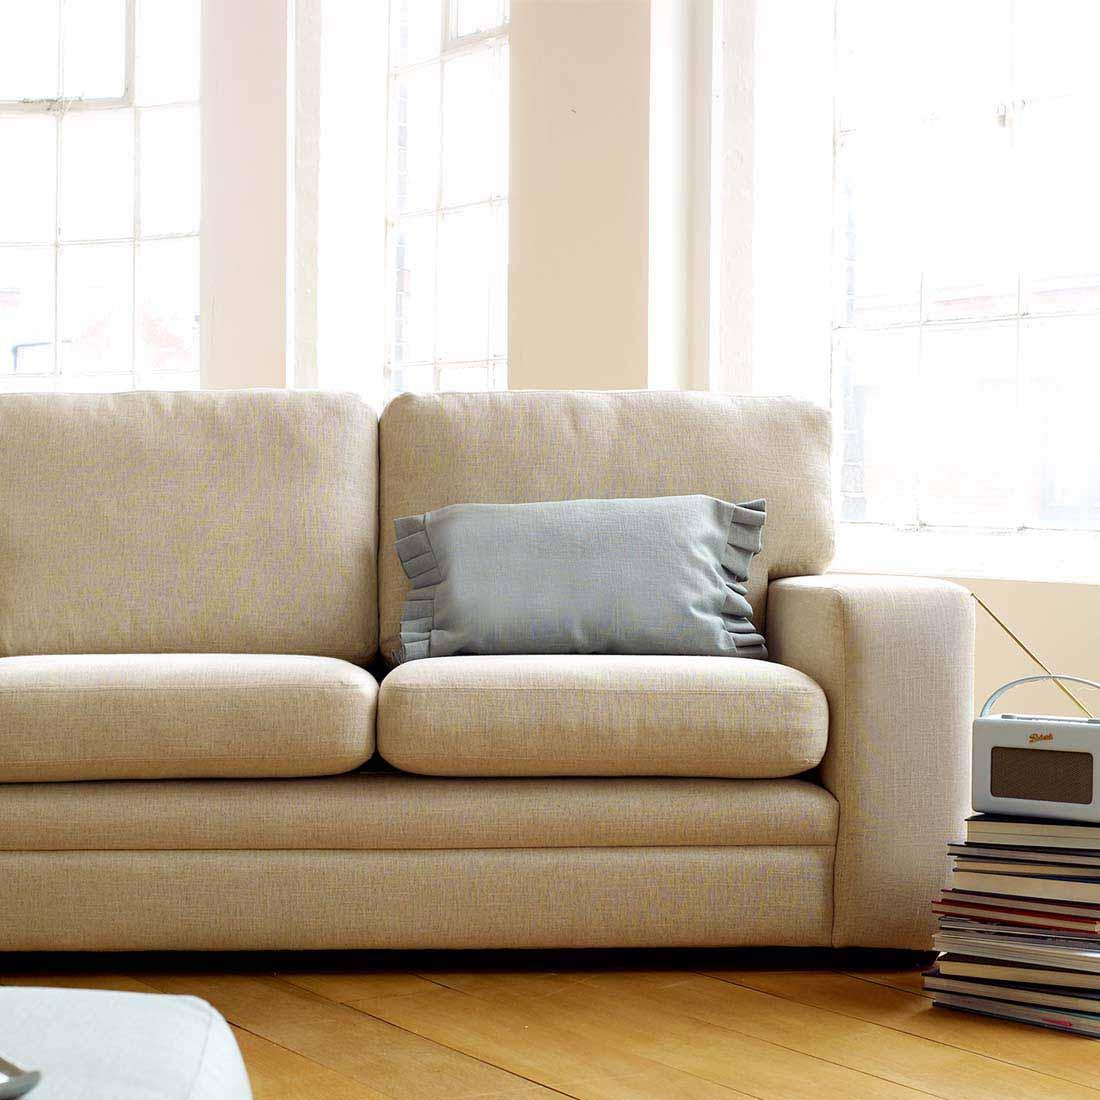 doctor sofa bronx knislinge black leather ivy deborah reversible sectional reviews